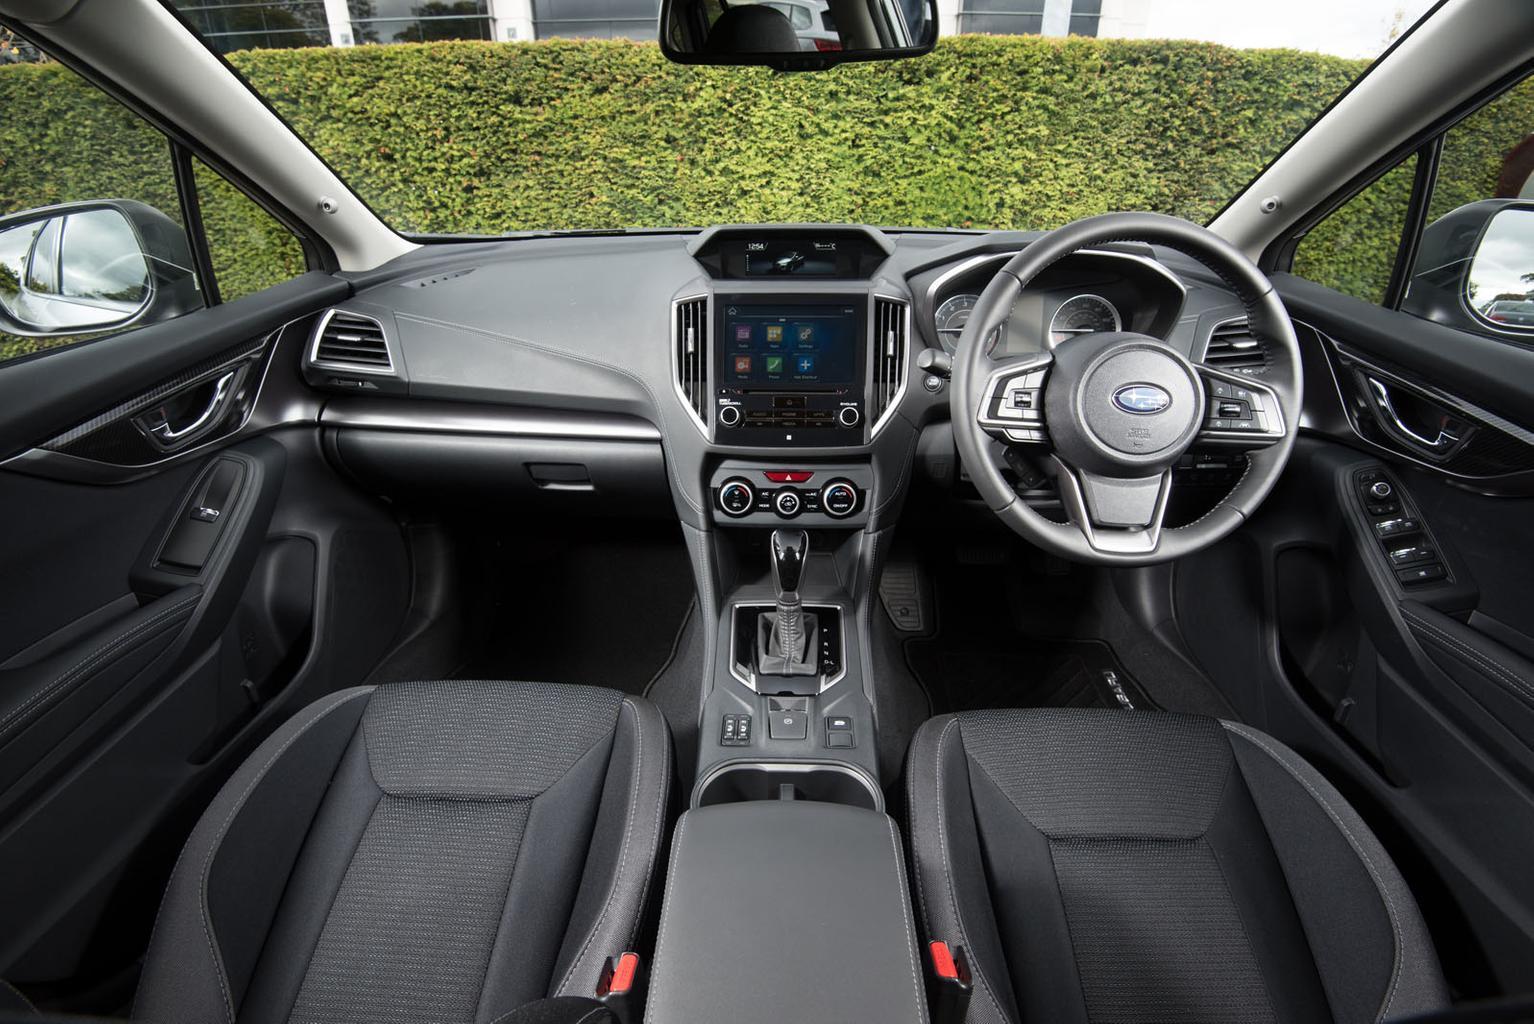 2018 Subaru Impreza review - price, specs and release date